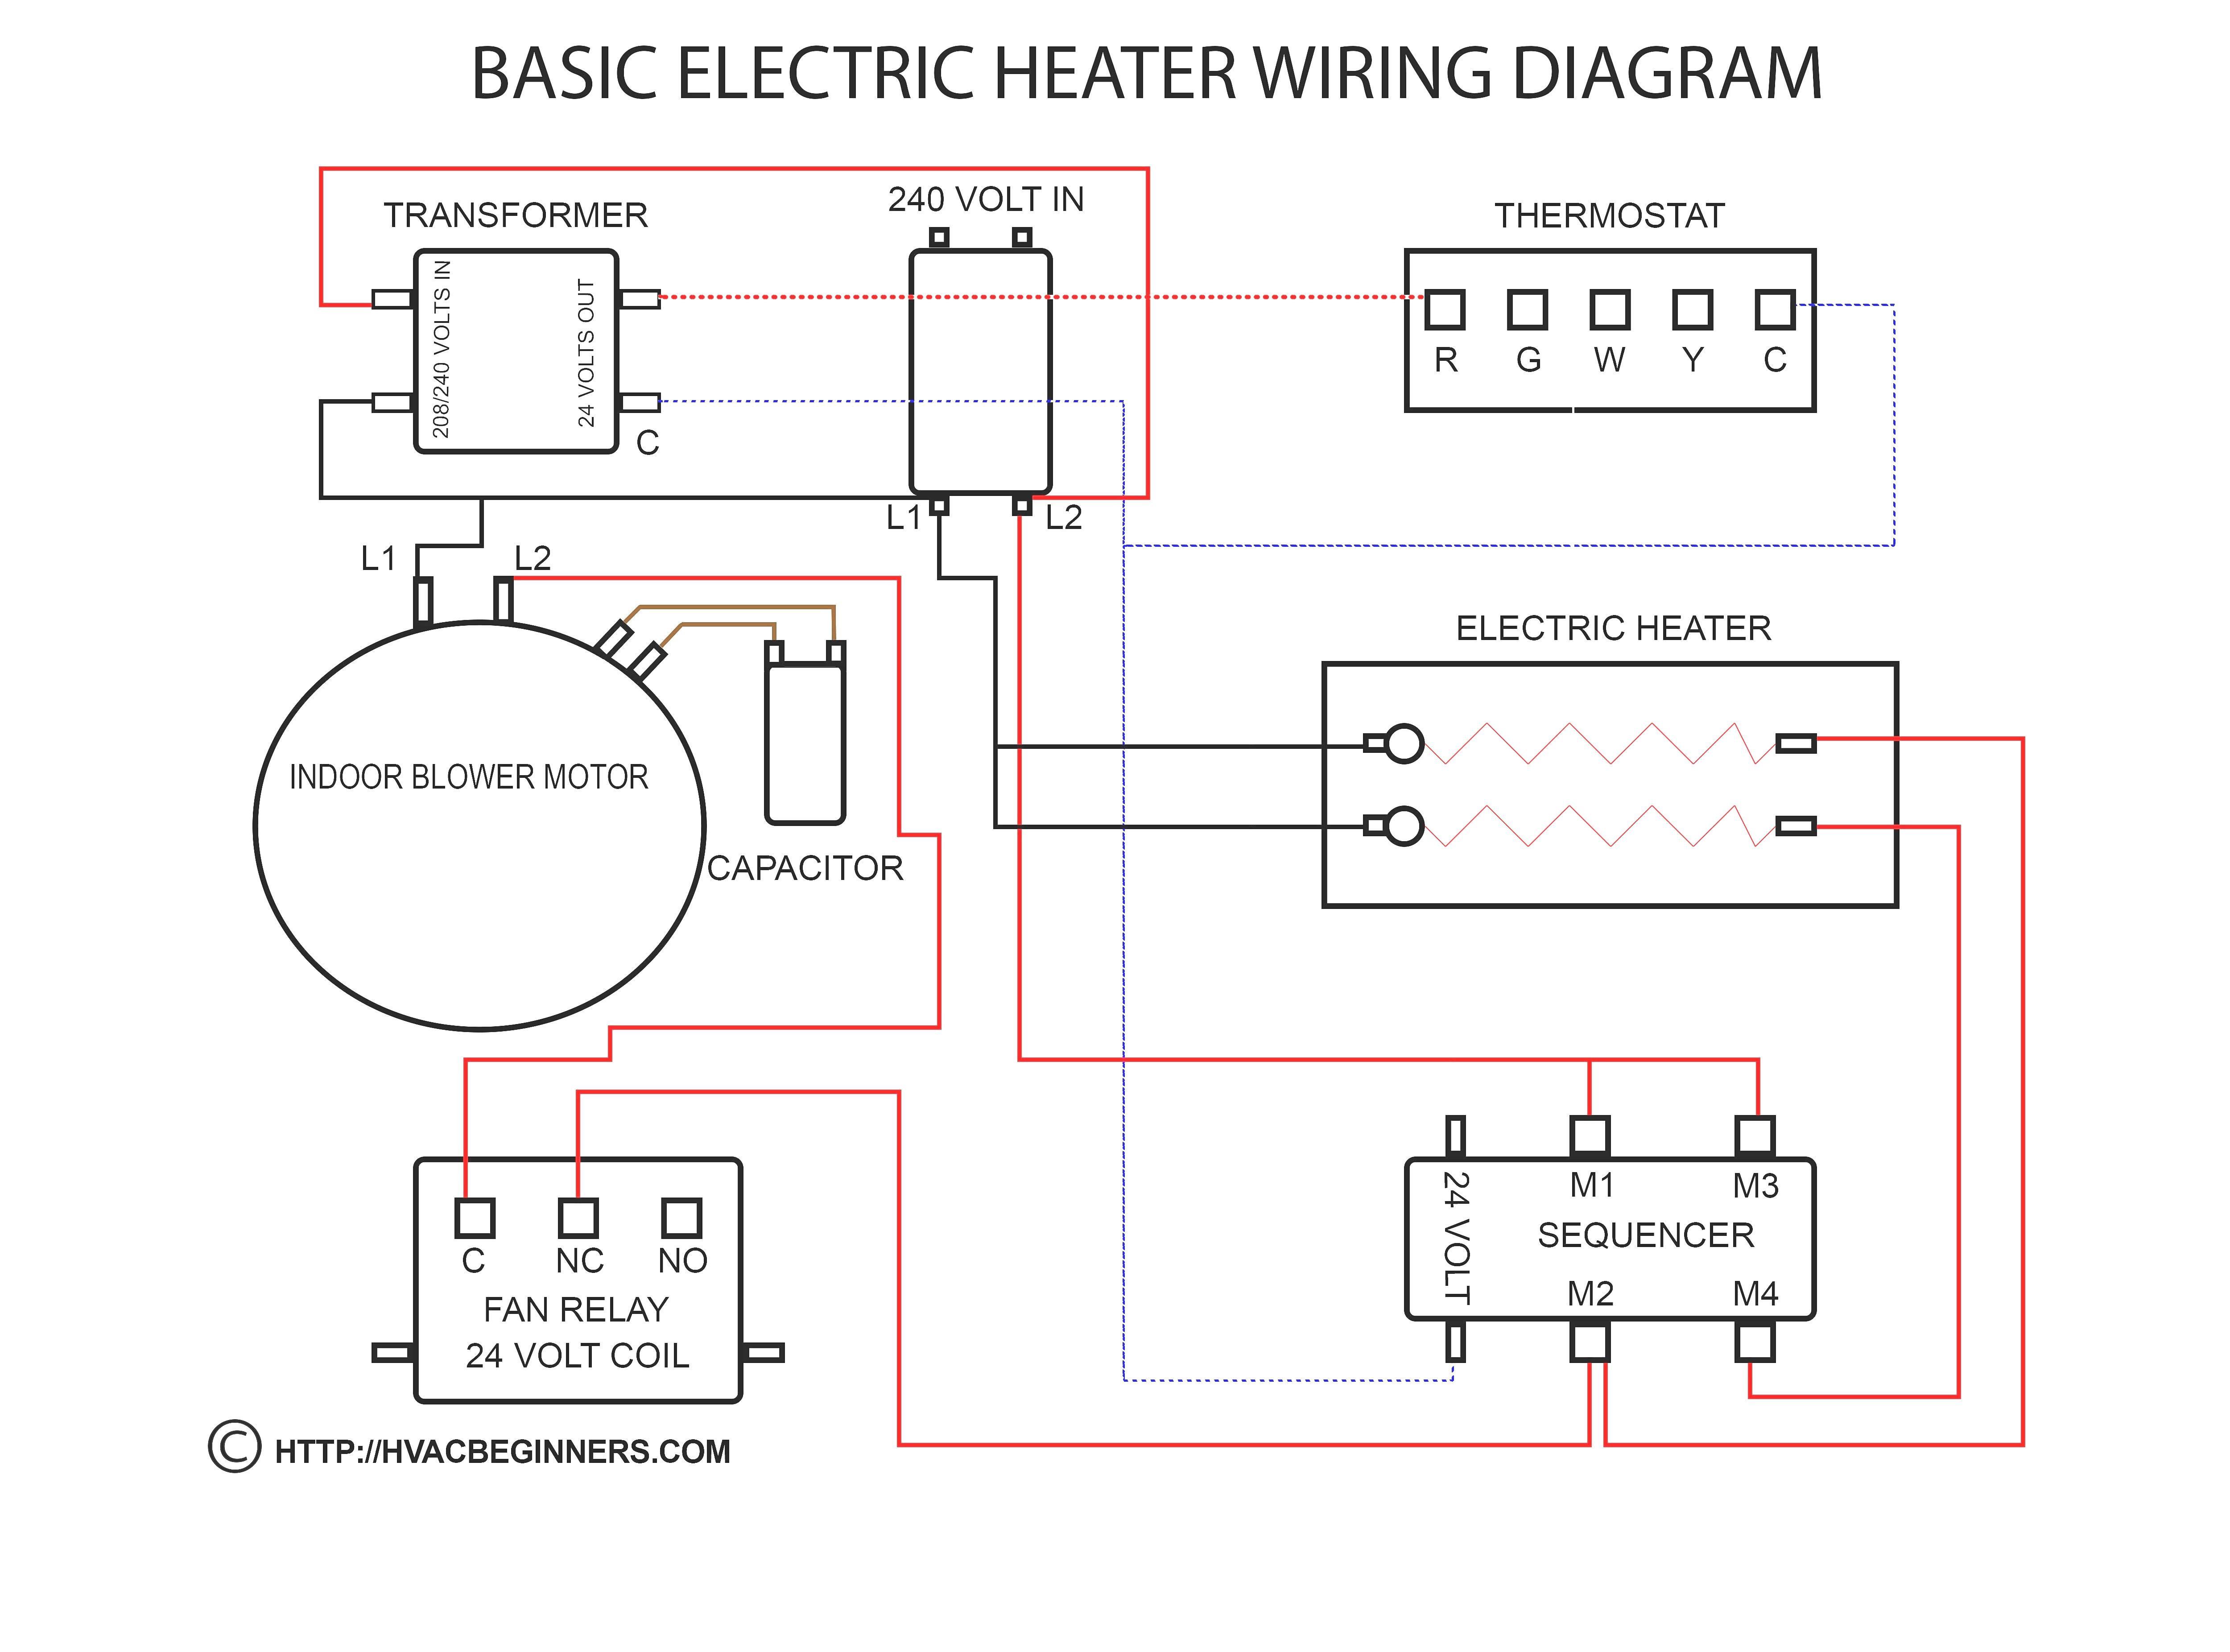 ac wiring diagram new wiring diagram a c wiring diagram a c wiring diagram